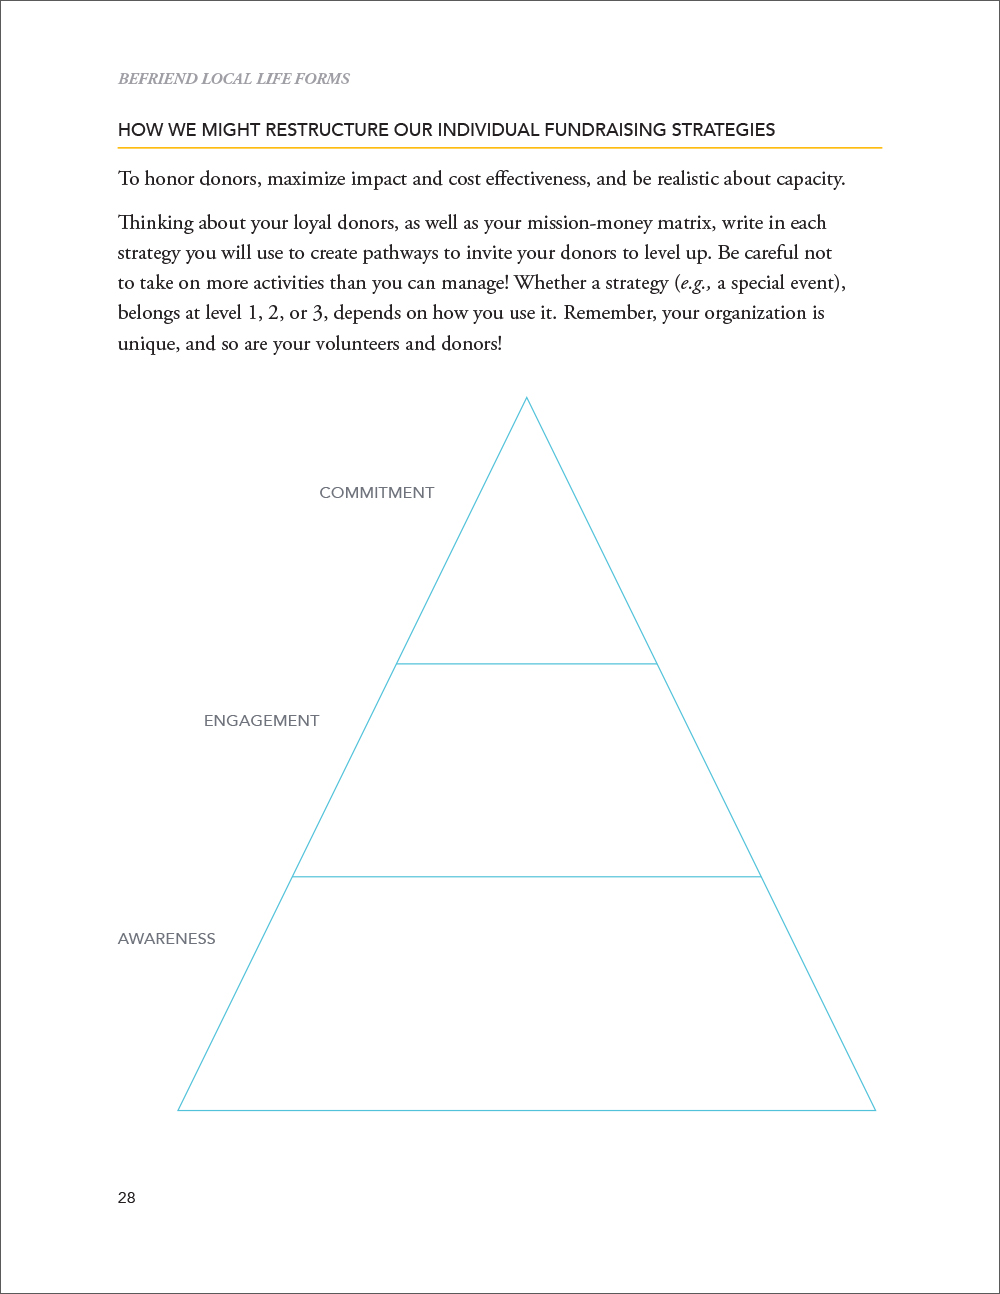 MNA-GuideToTheGalaxy-Workbook-28.jpg